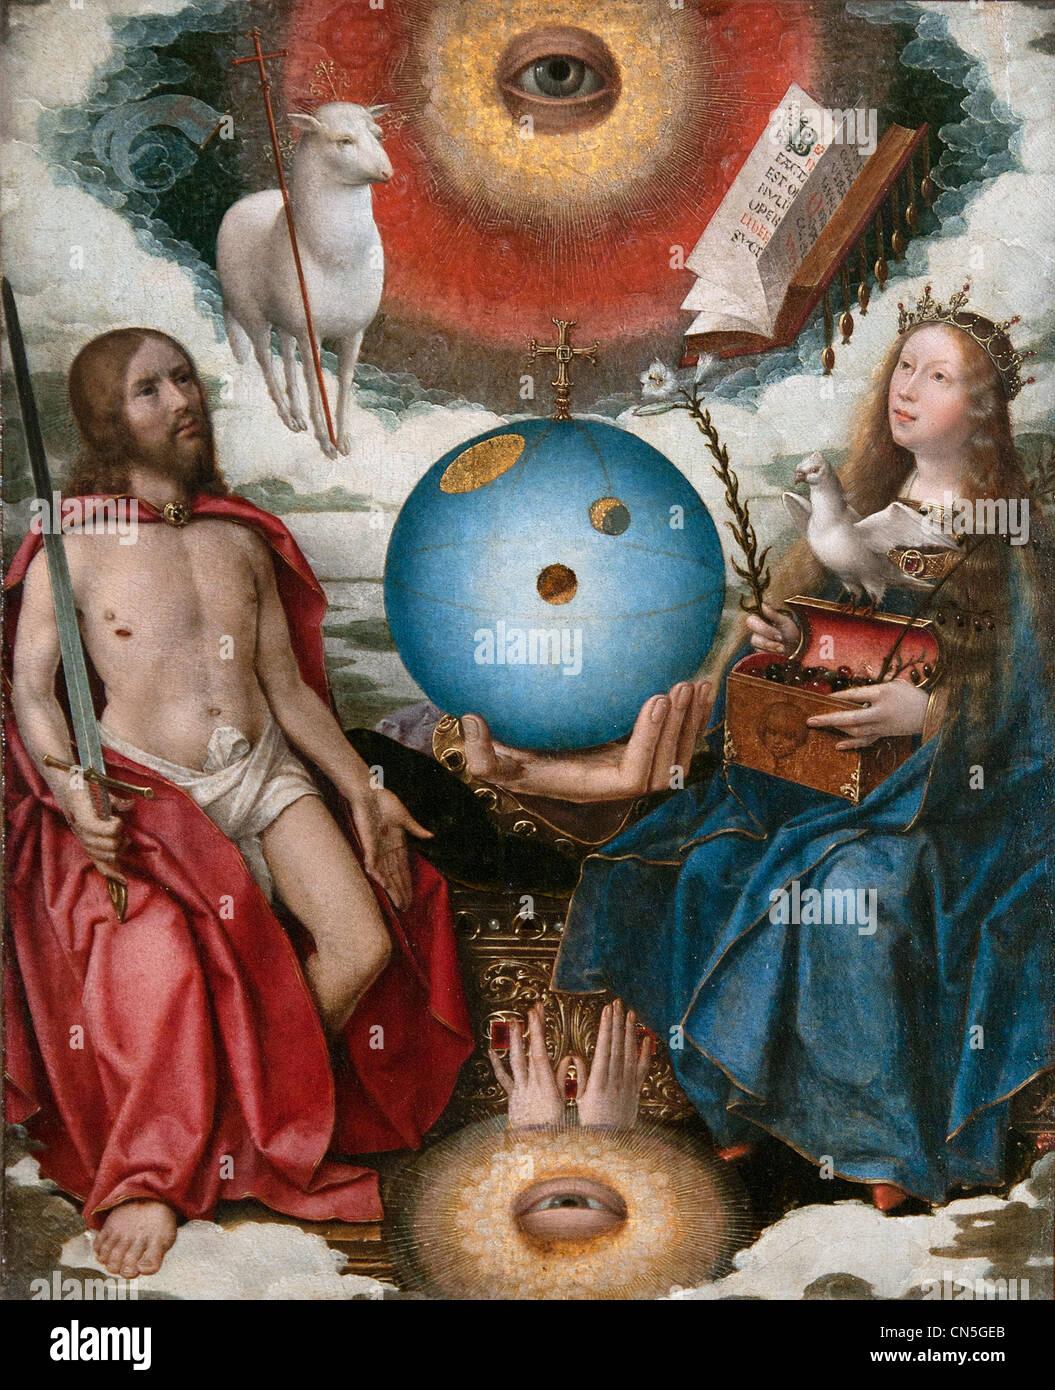 Christian allegory by Jan Provost 1465 - 1529 Belgian Belgium Stock Photo